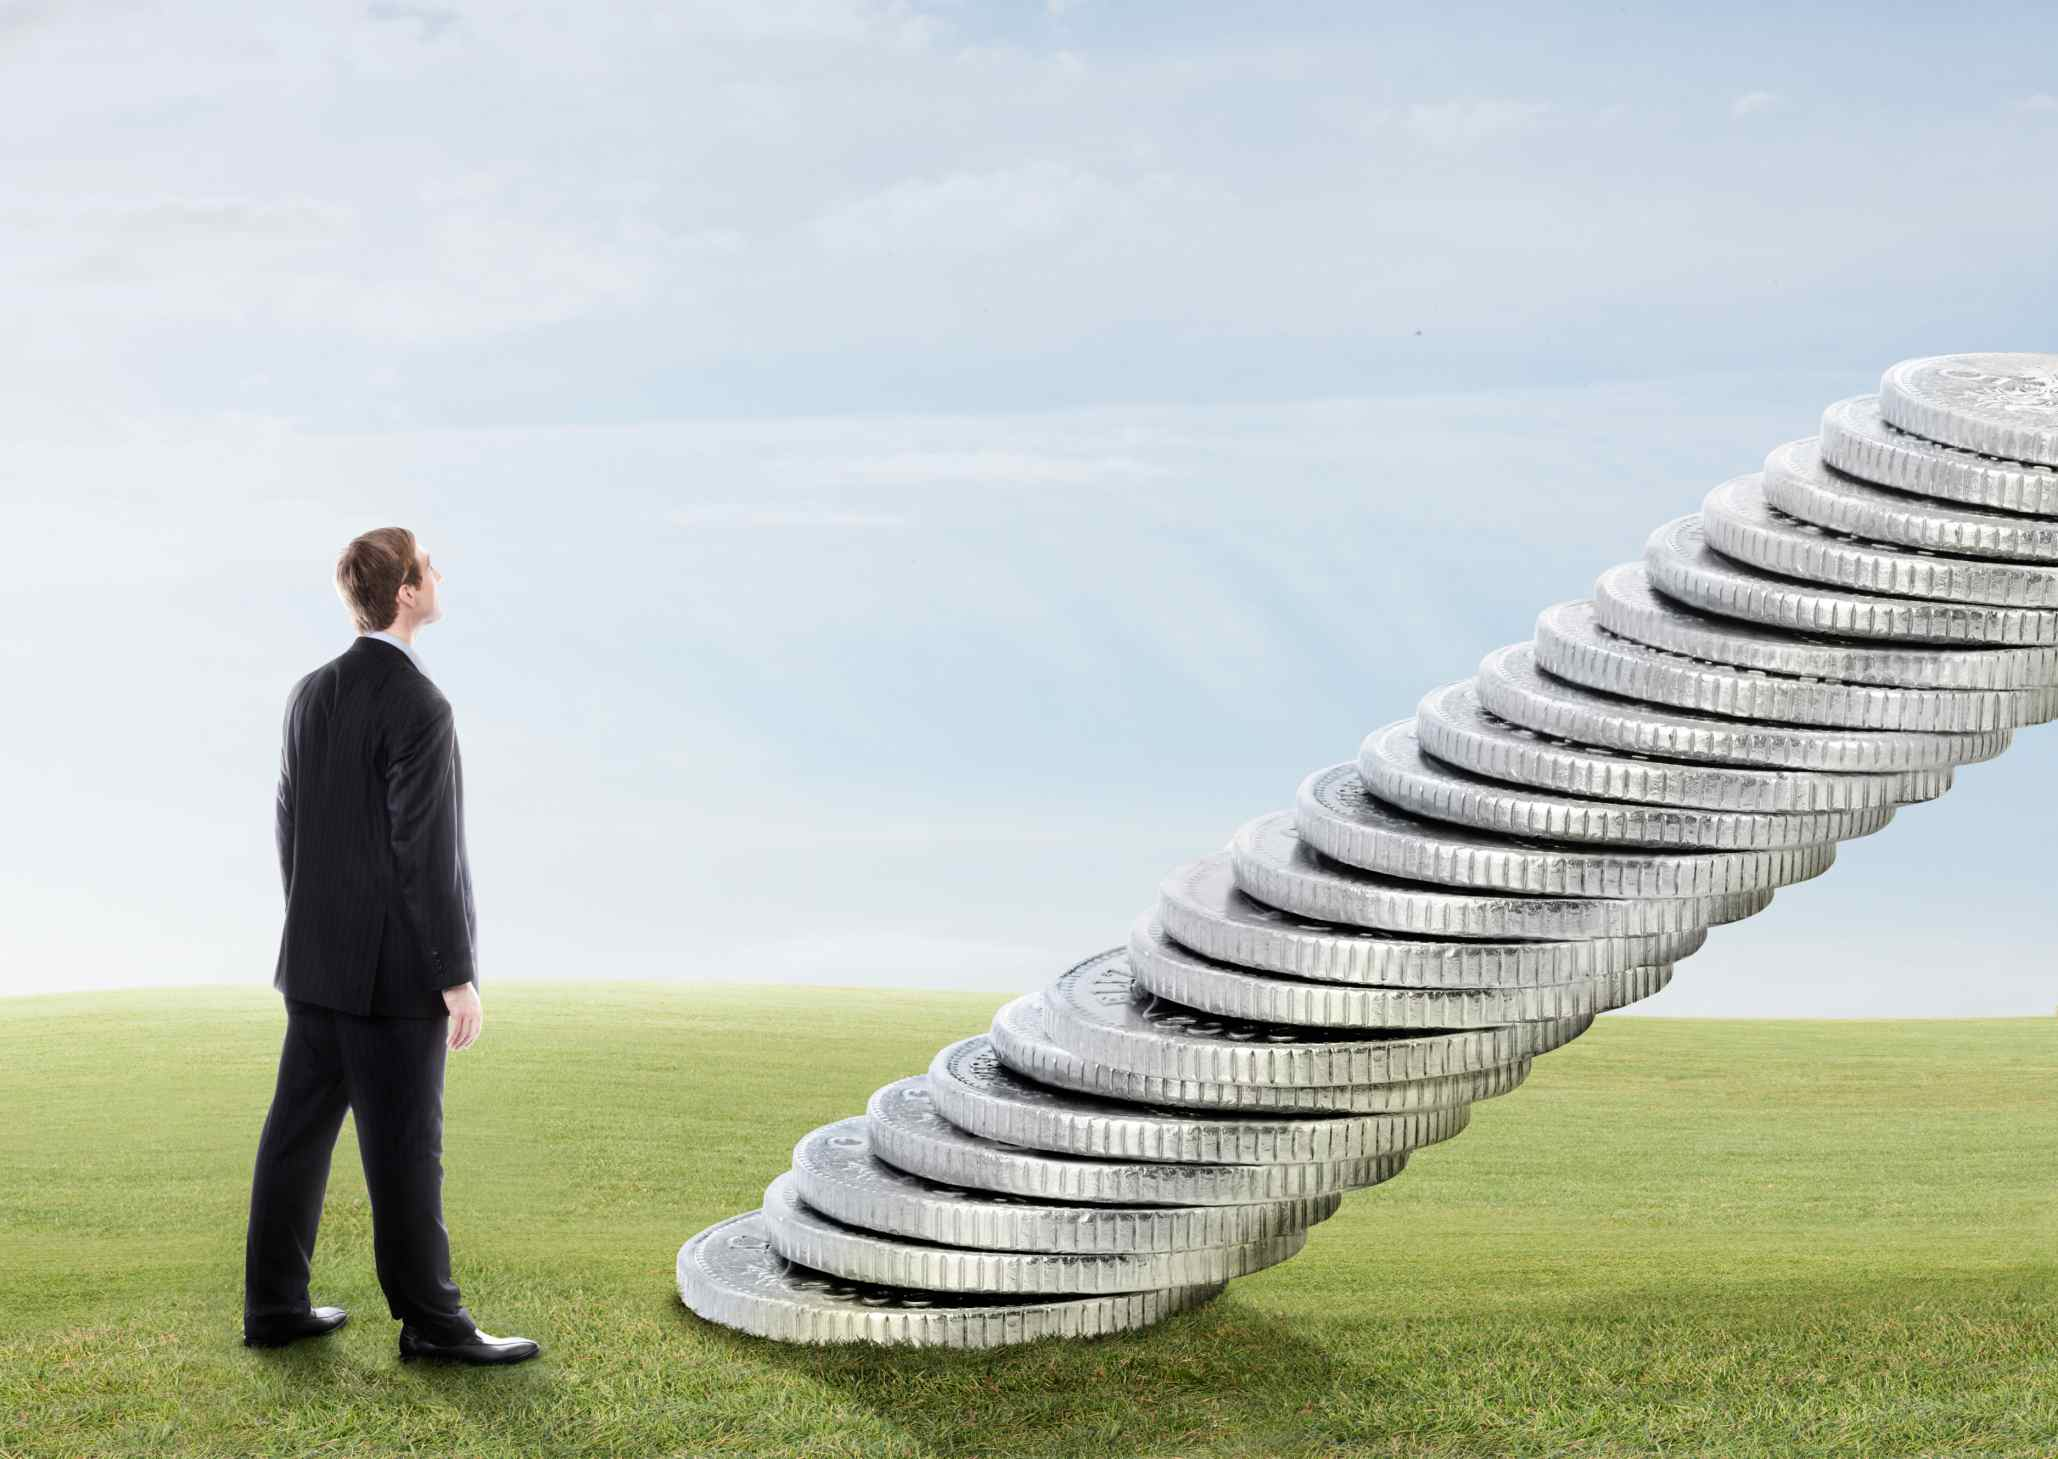 Persona frente a una escalera de dinero.